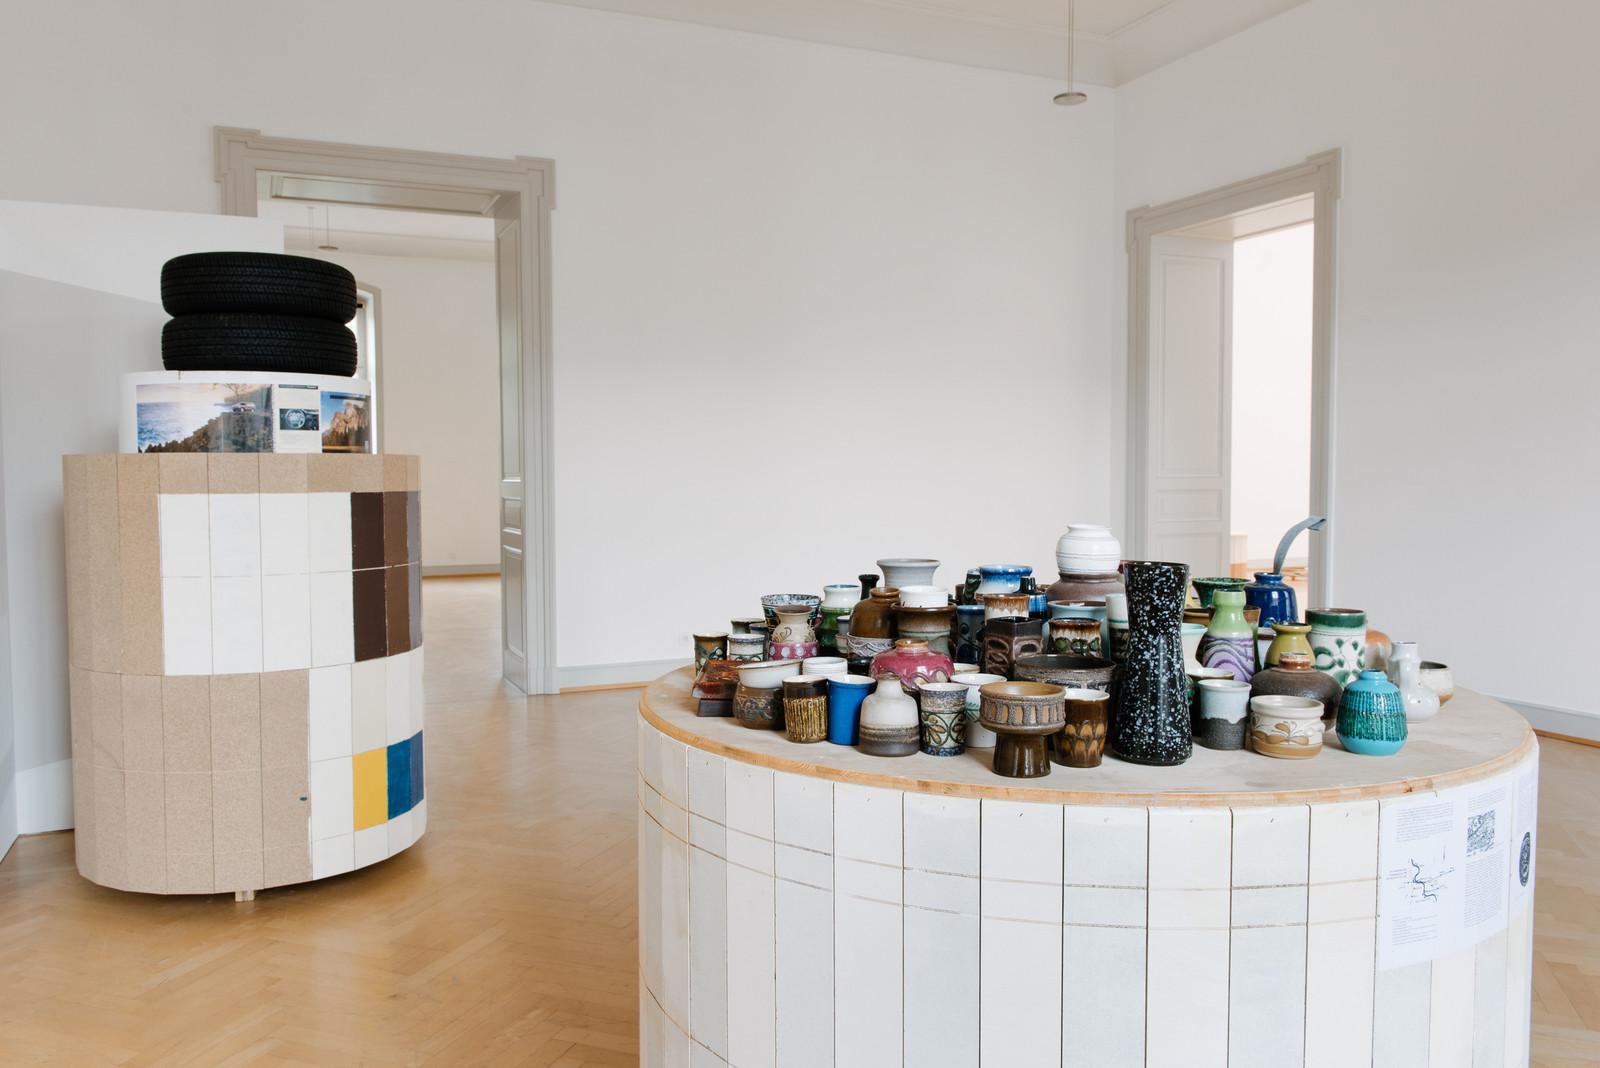 07_Installationsansicht_St.Gallen__Foto_Sebastian_Stadler